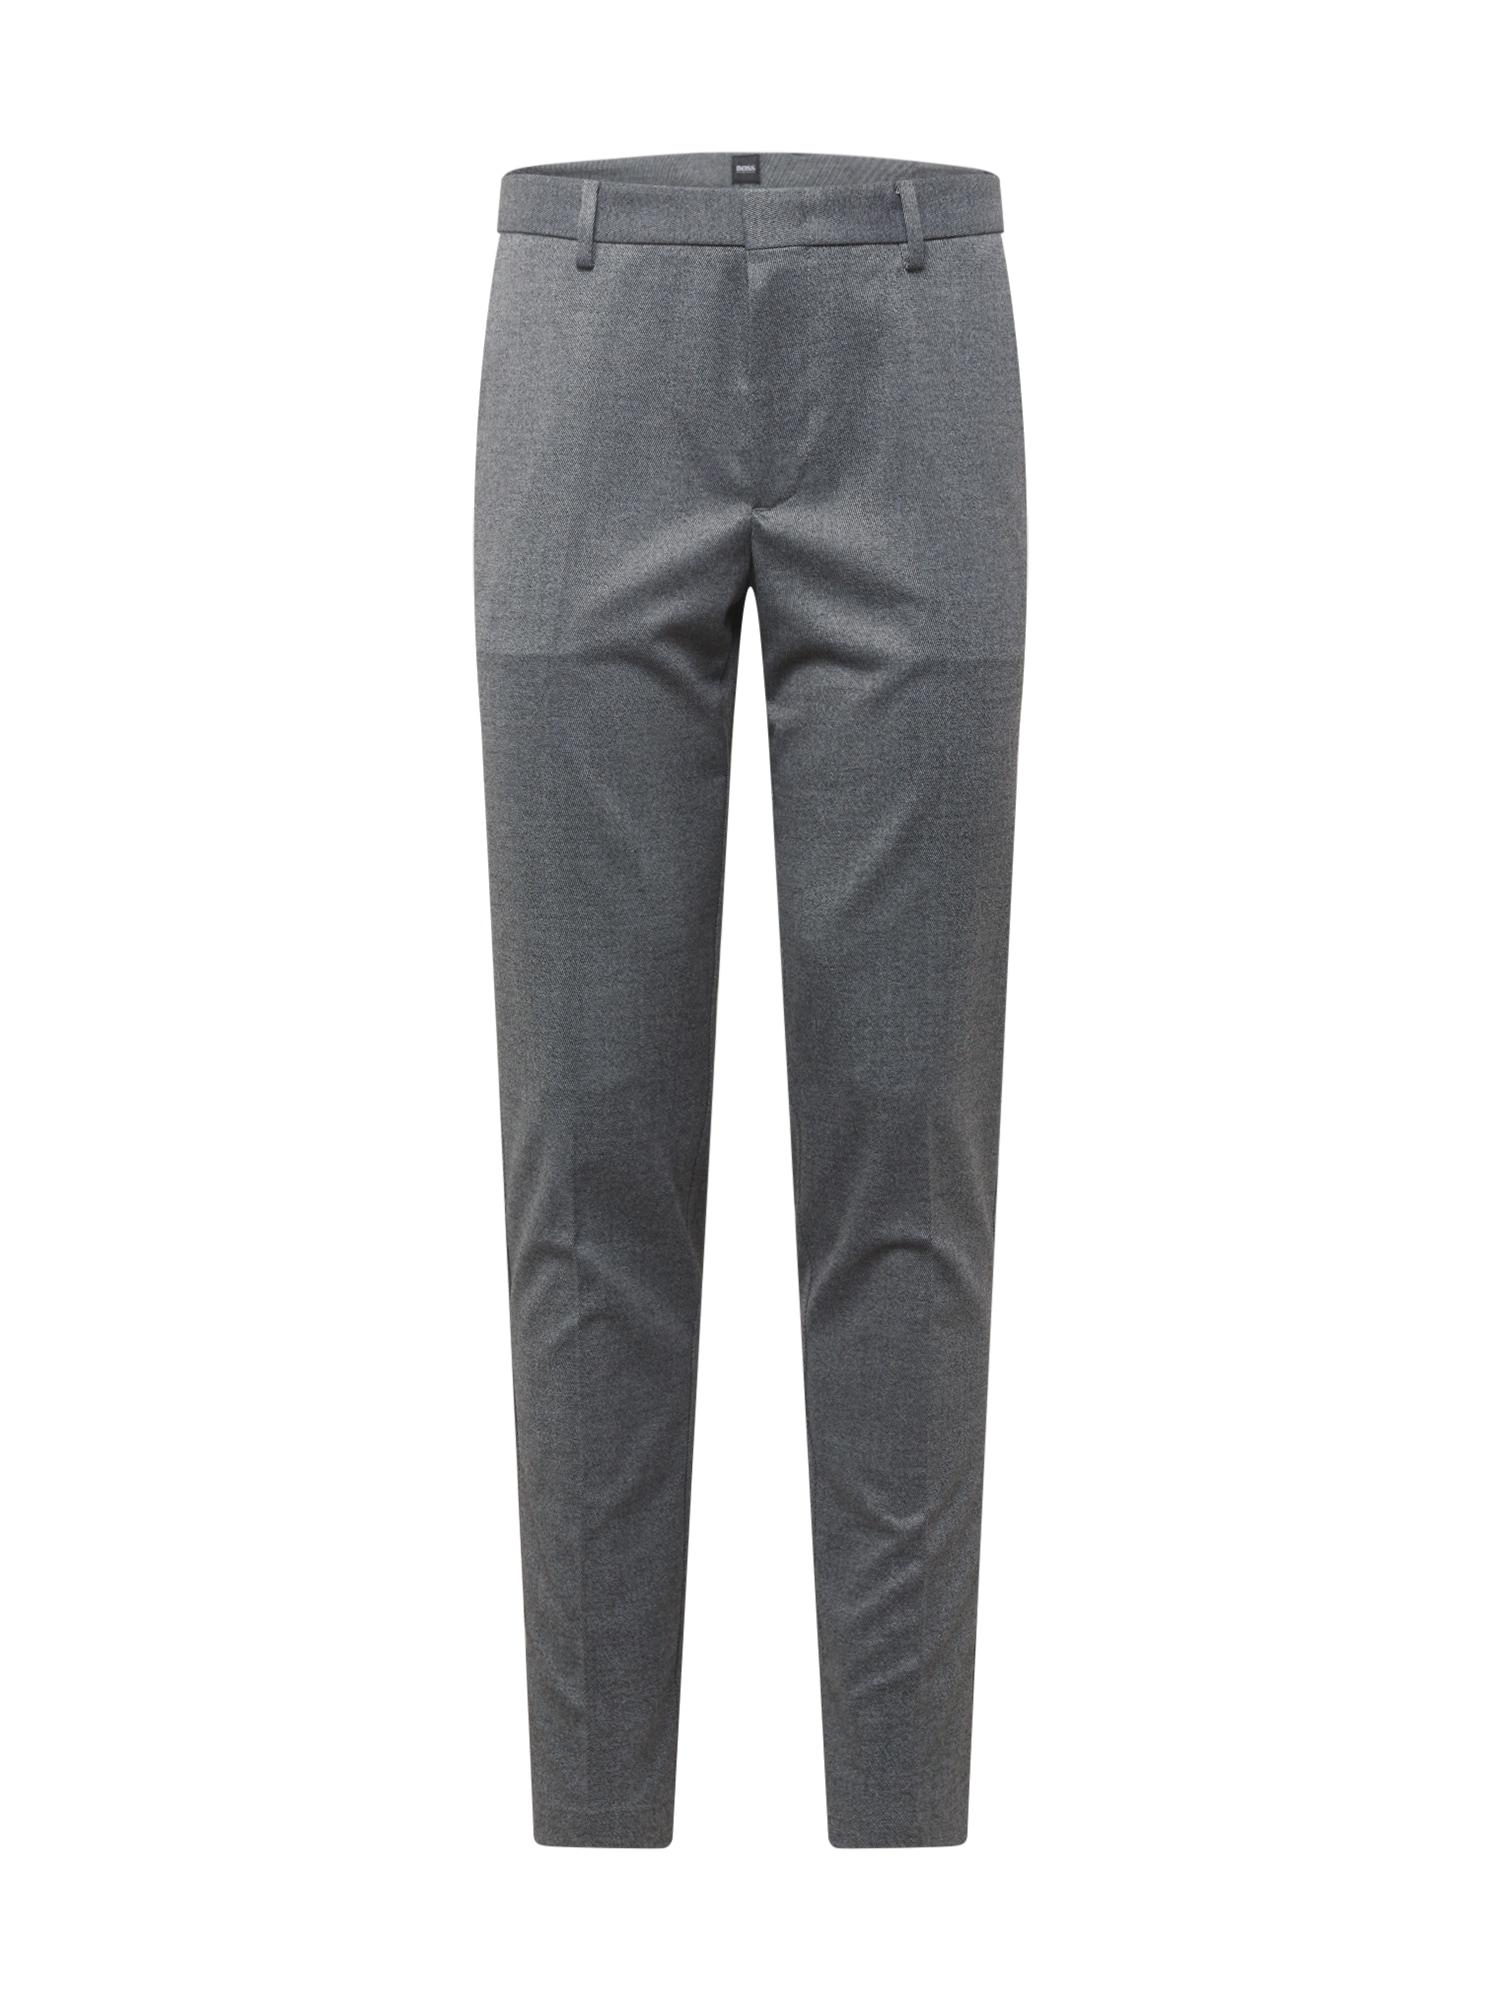 BOSS Kalhoty s puky 'Kaito1'  šedý melír